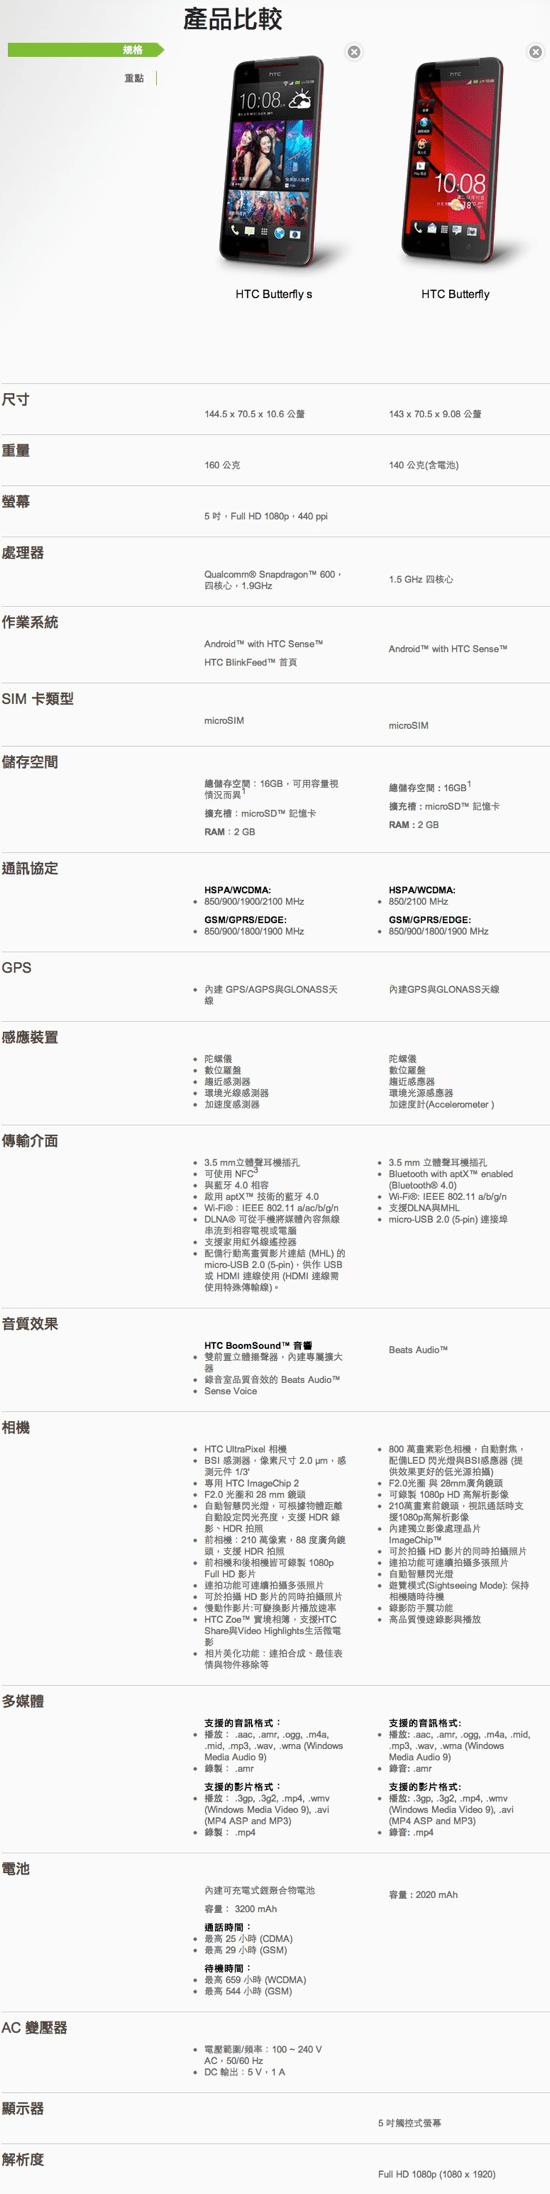 HTC Smartphones  Compare  1